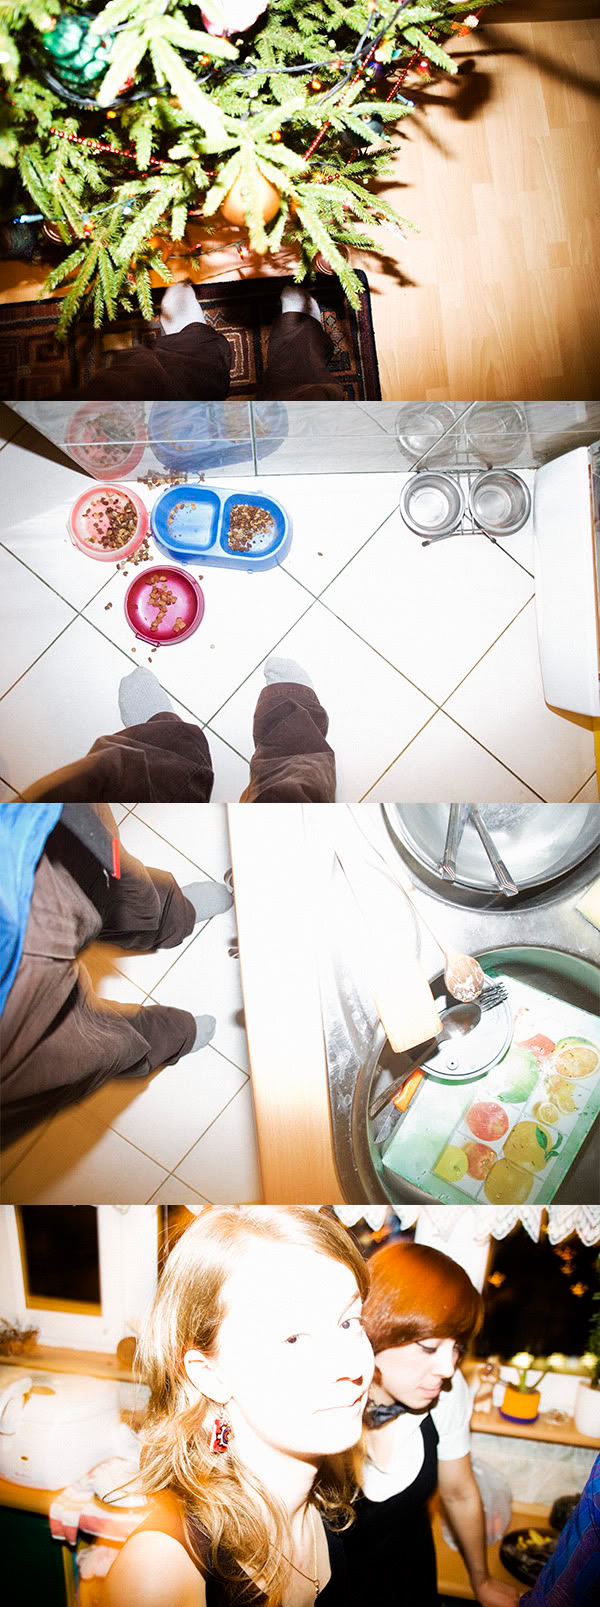 moje stopy, my legs, Natalia, Ada, Choinka, christmas tree, miski, bowls, bałagan, mess